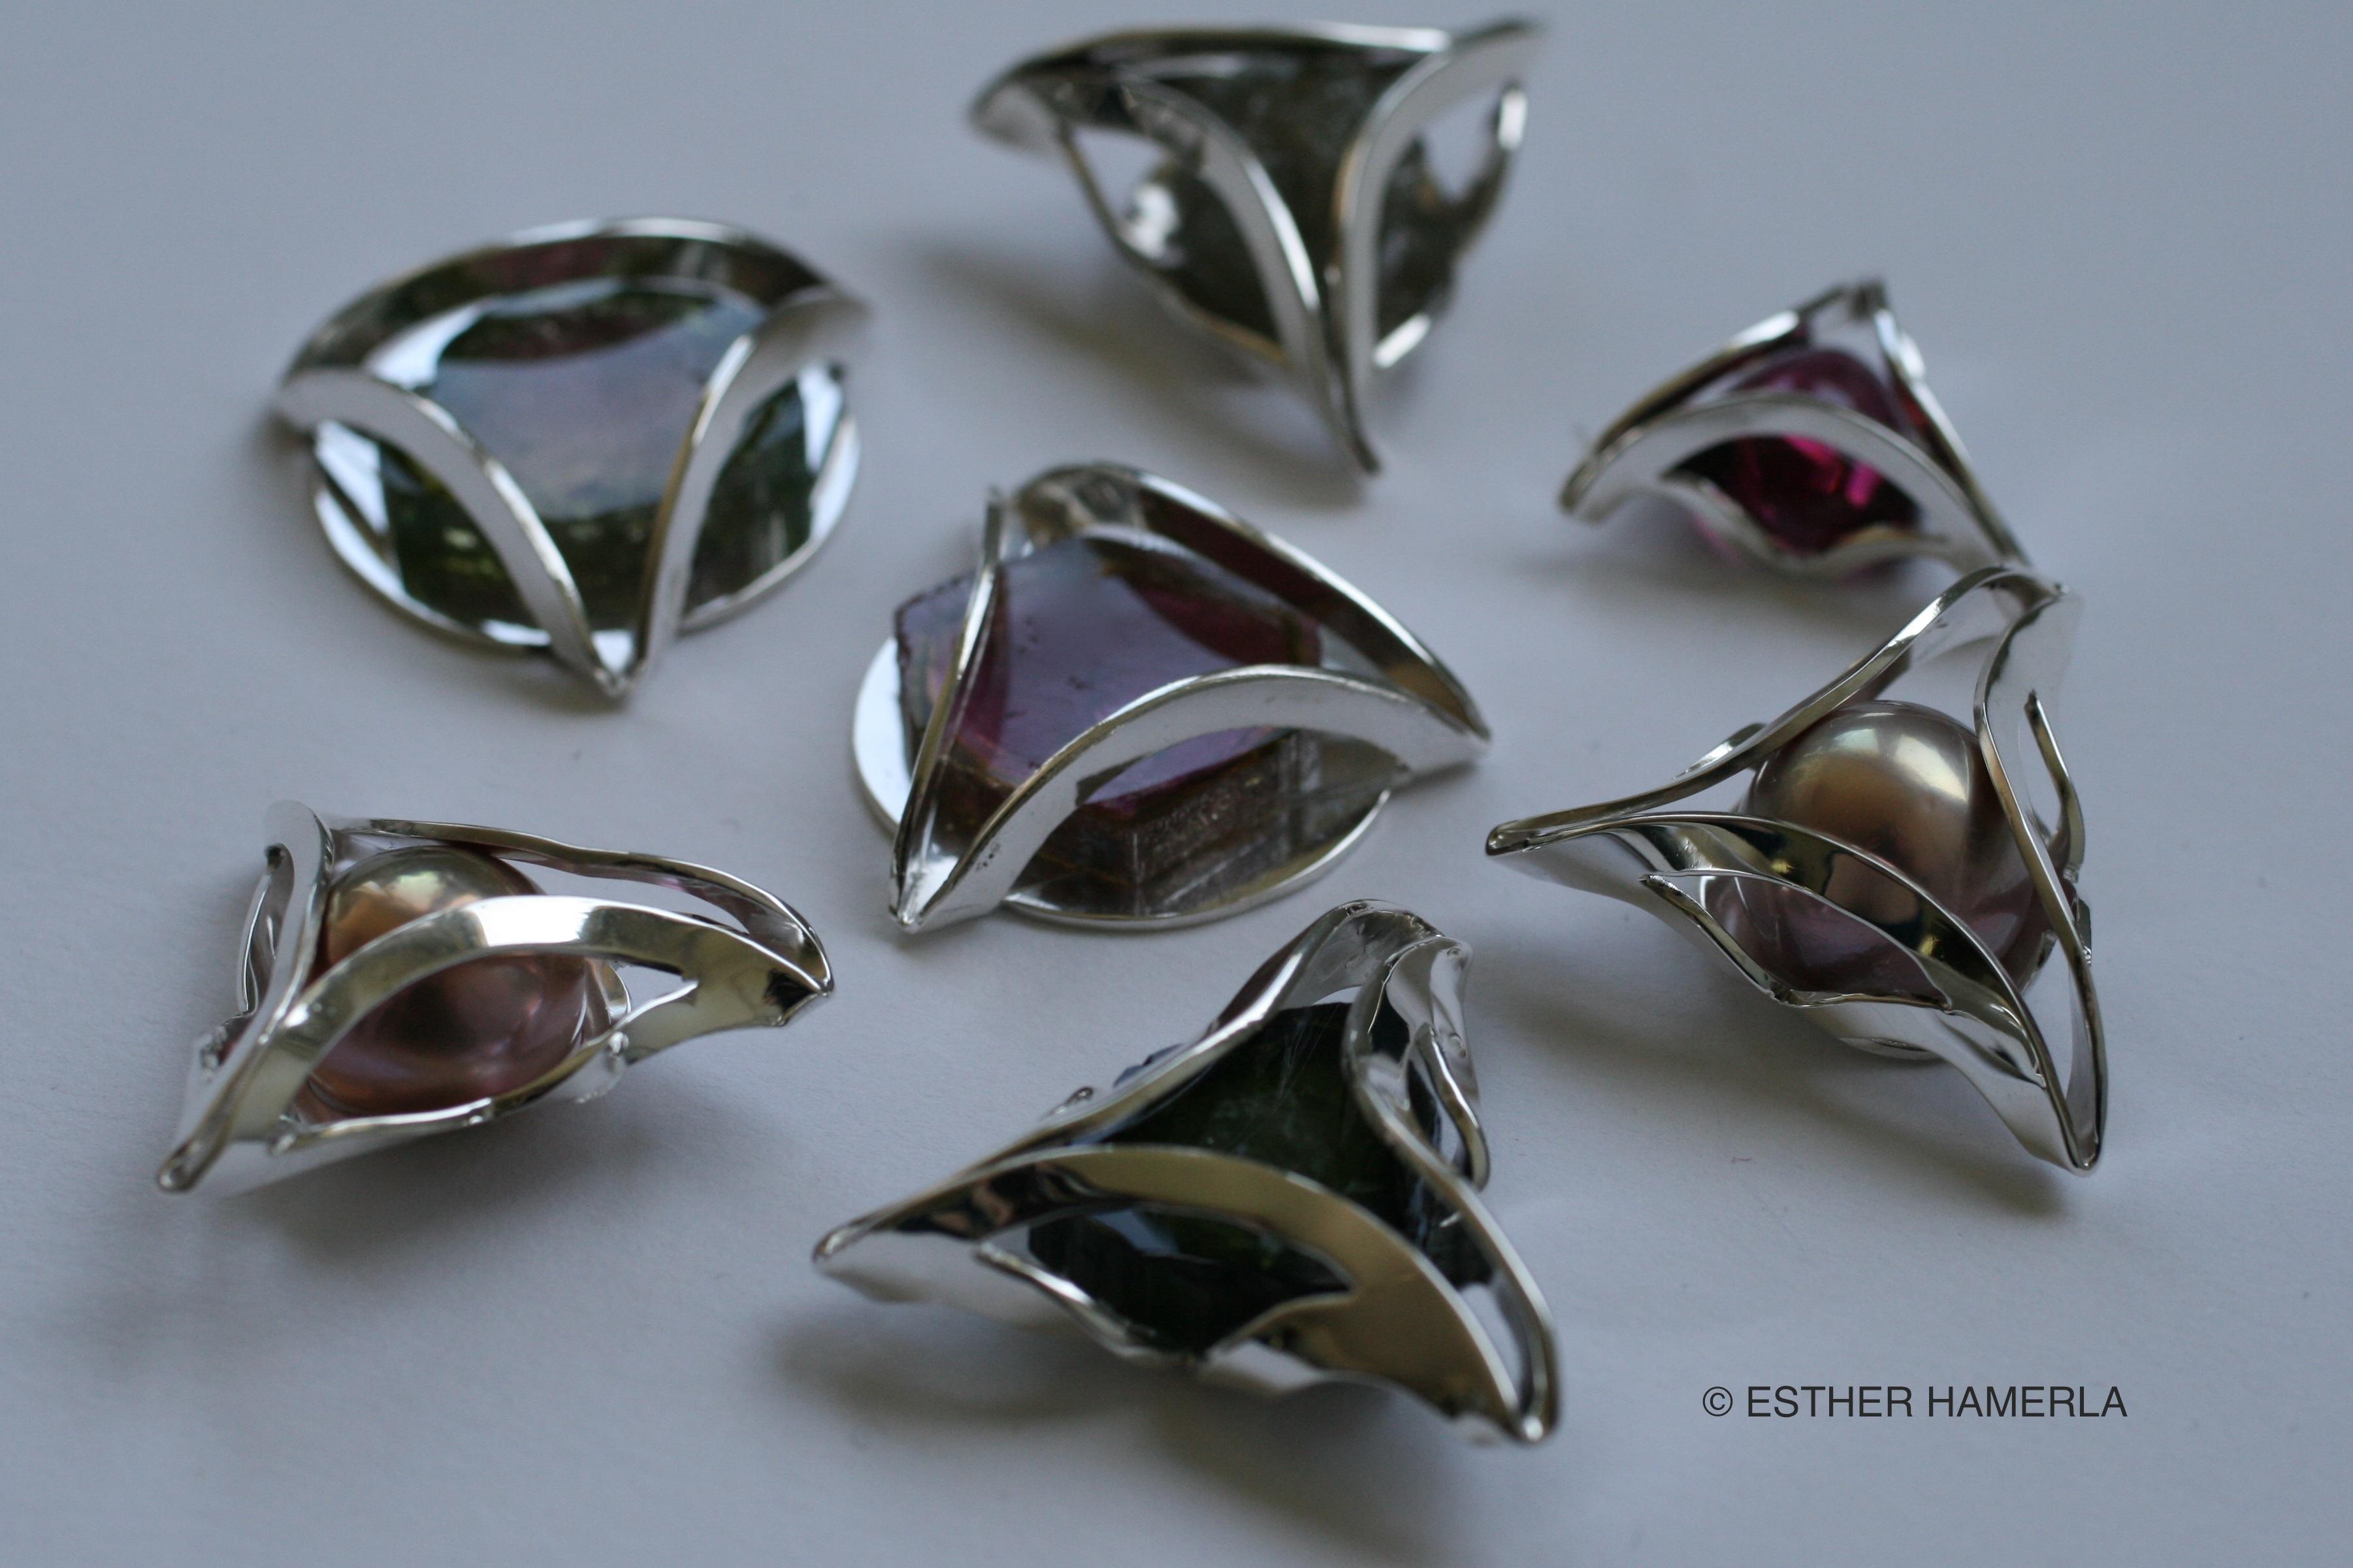 pendentif-exposition-Esther-Hamerla-artisan-d-art-tourmaline-perle